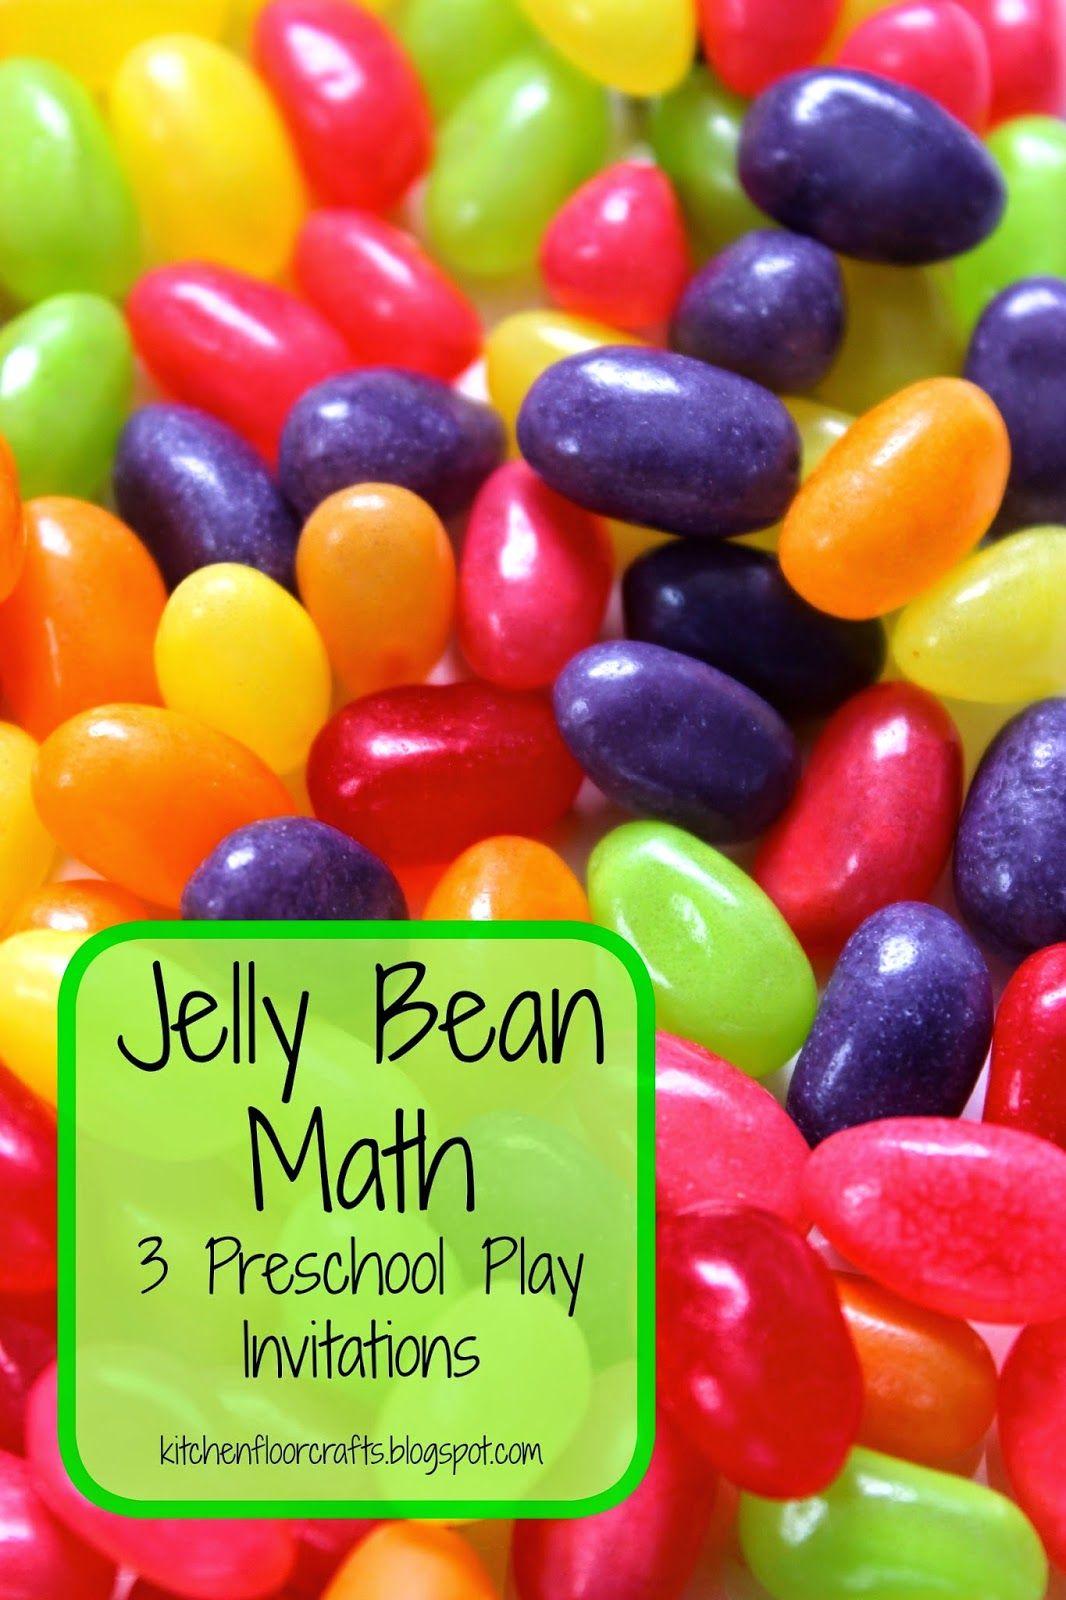 Jelly Bean Math 3 Preschool Play Invitations